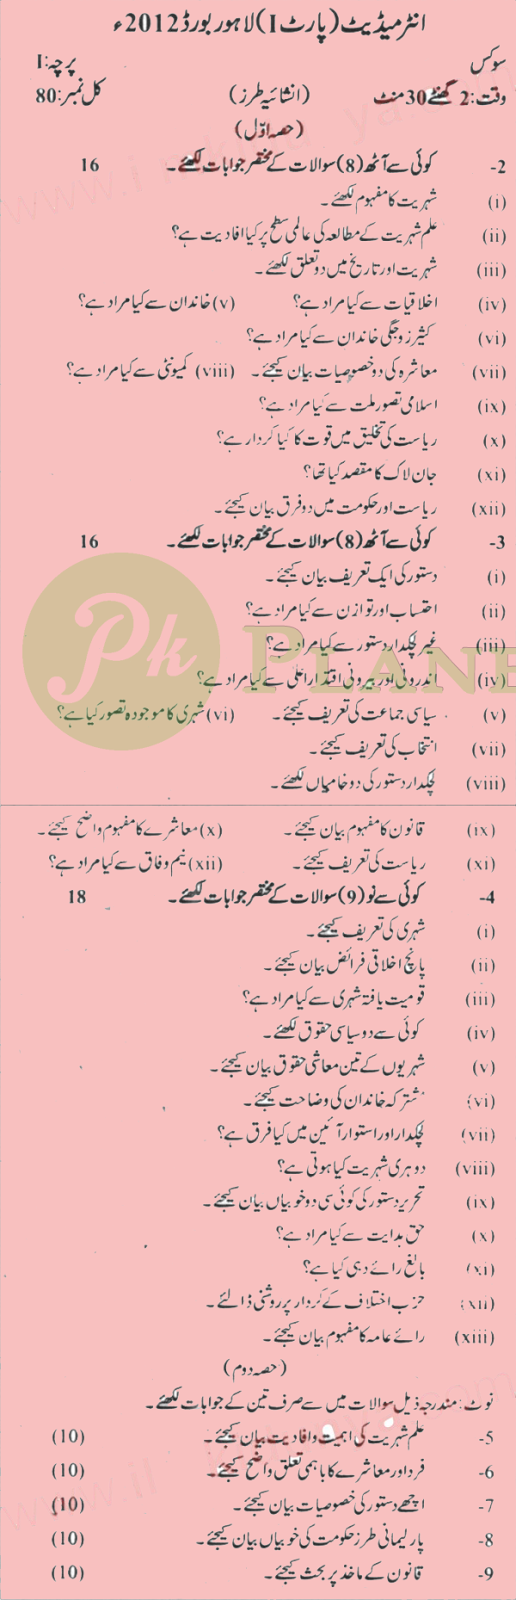 Past Papers Civics Intermediate Part 1 Lahore Board 2012